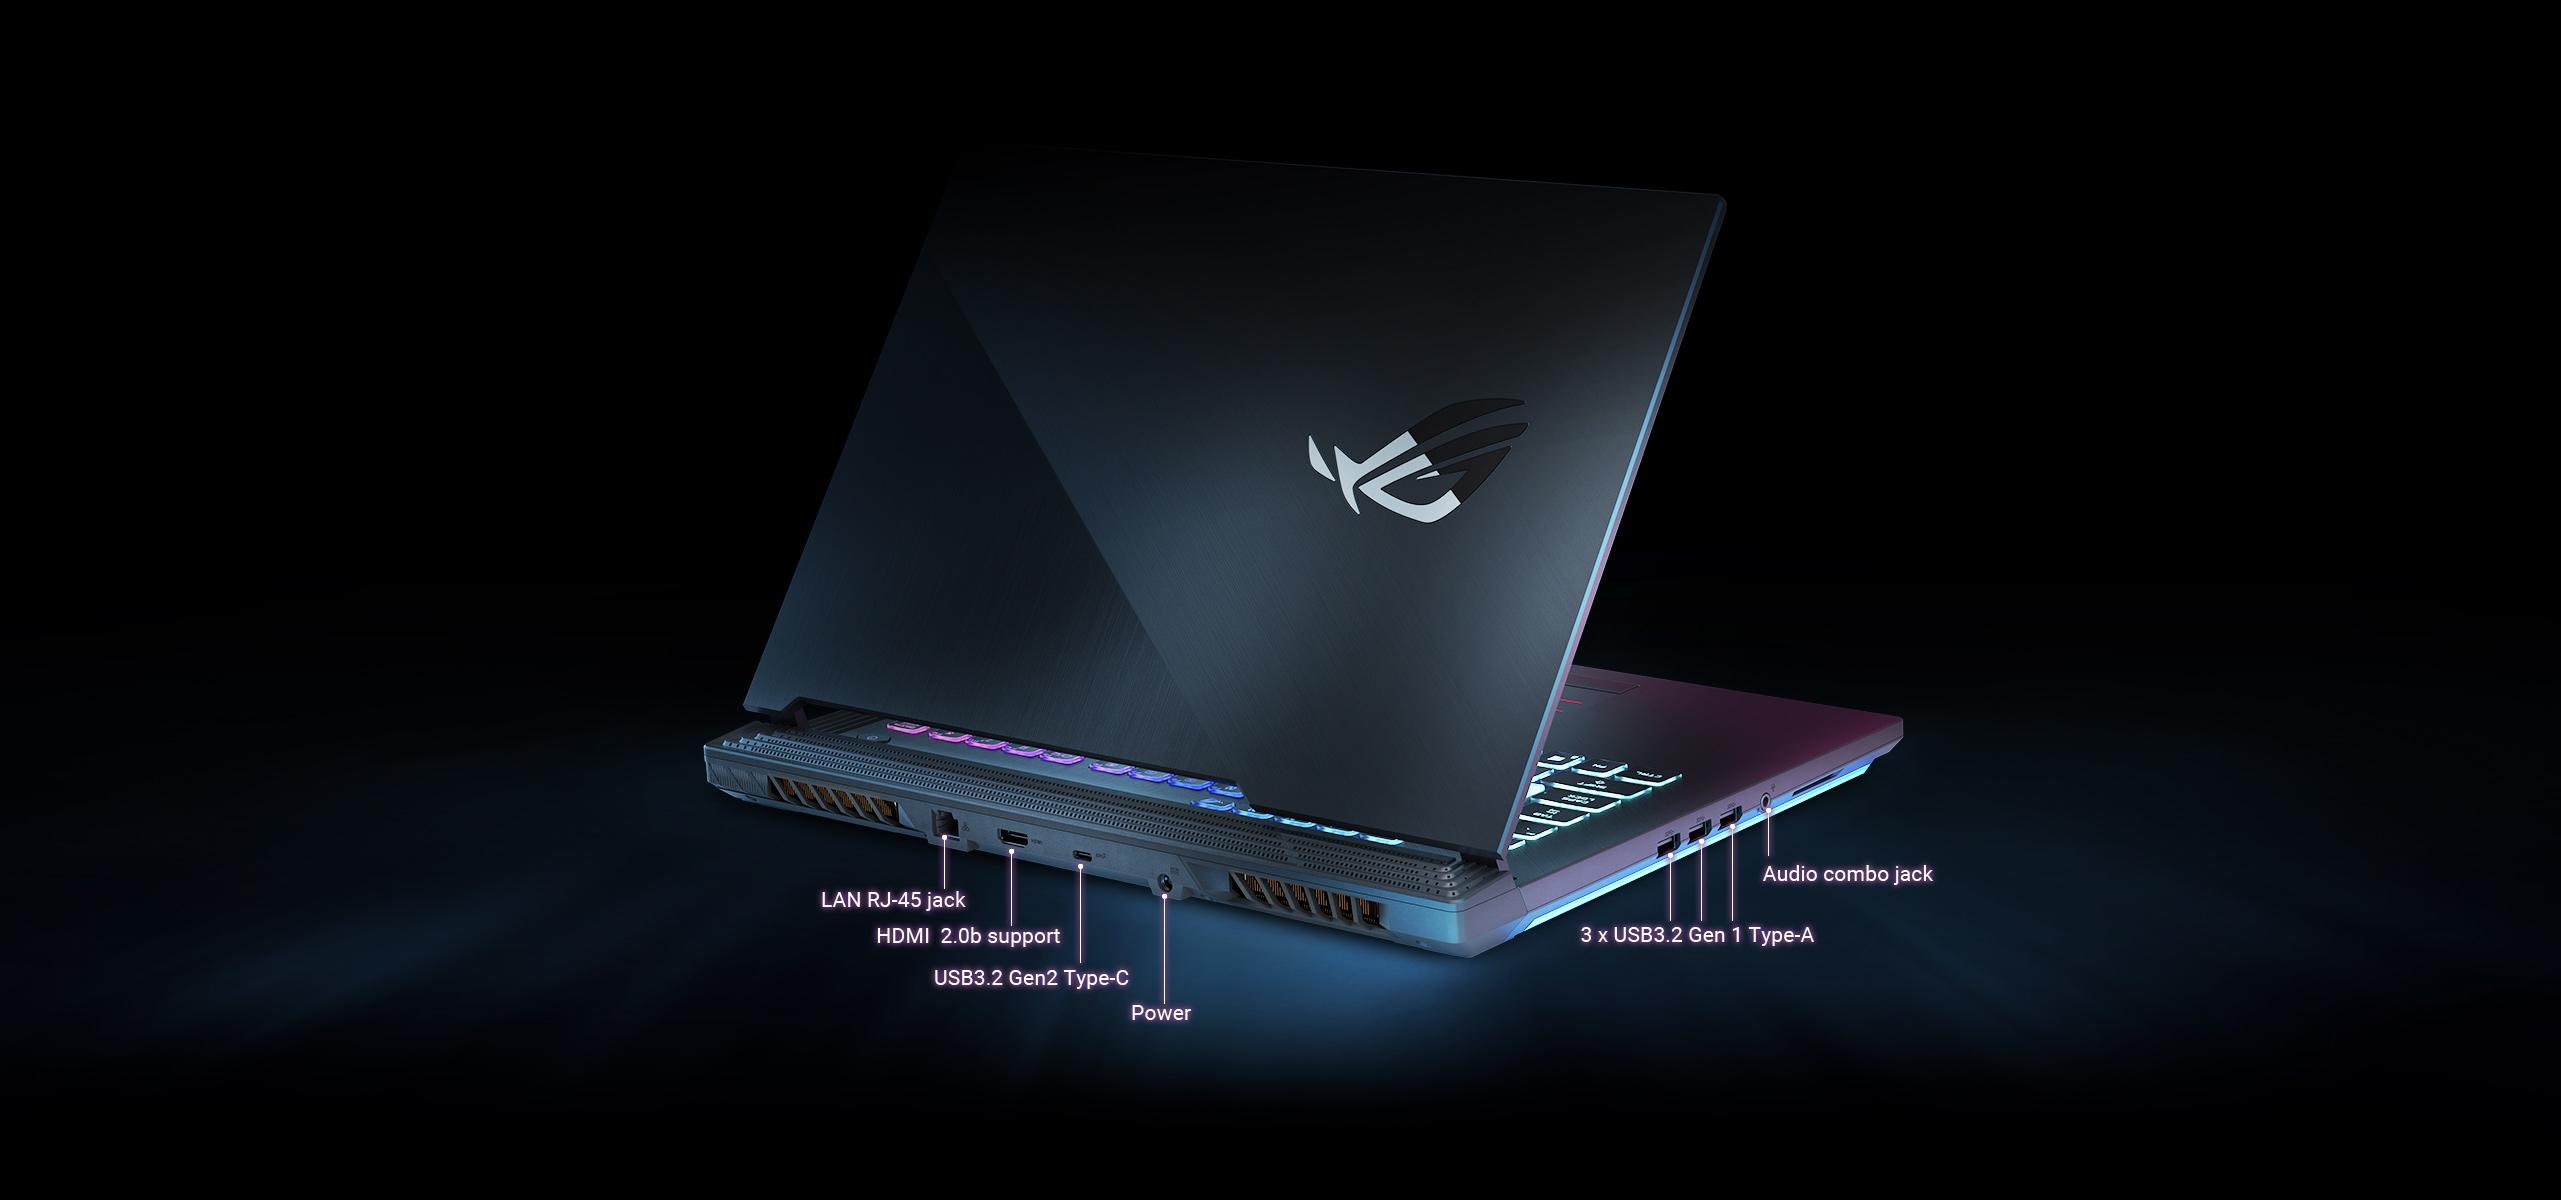 Asus ROG Strix G512LI Core i7 10th Gen 8GB 512GB SSD 4GB ...